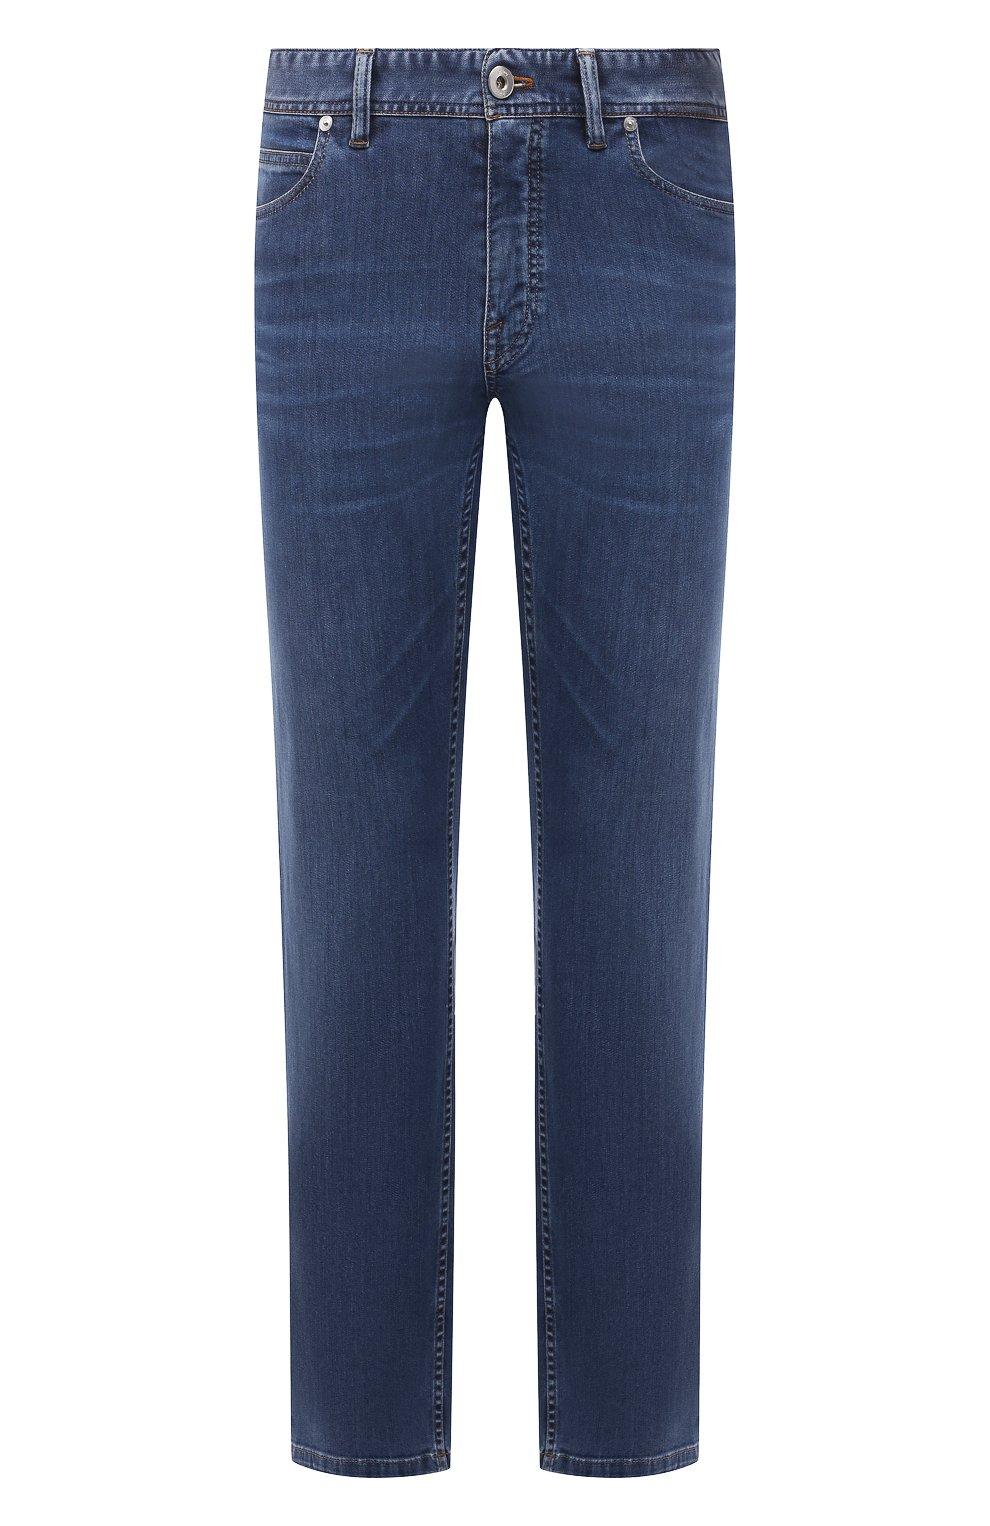 Мужские джинсы BRIONI синего цвета, арт. SPPB0M/P0D06/MERIBEL   Фото 1